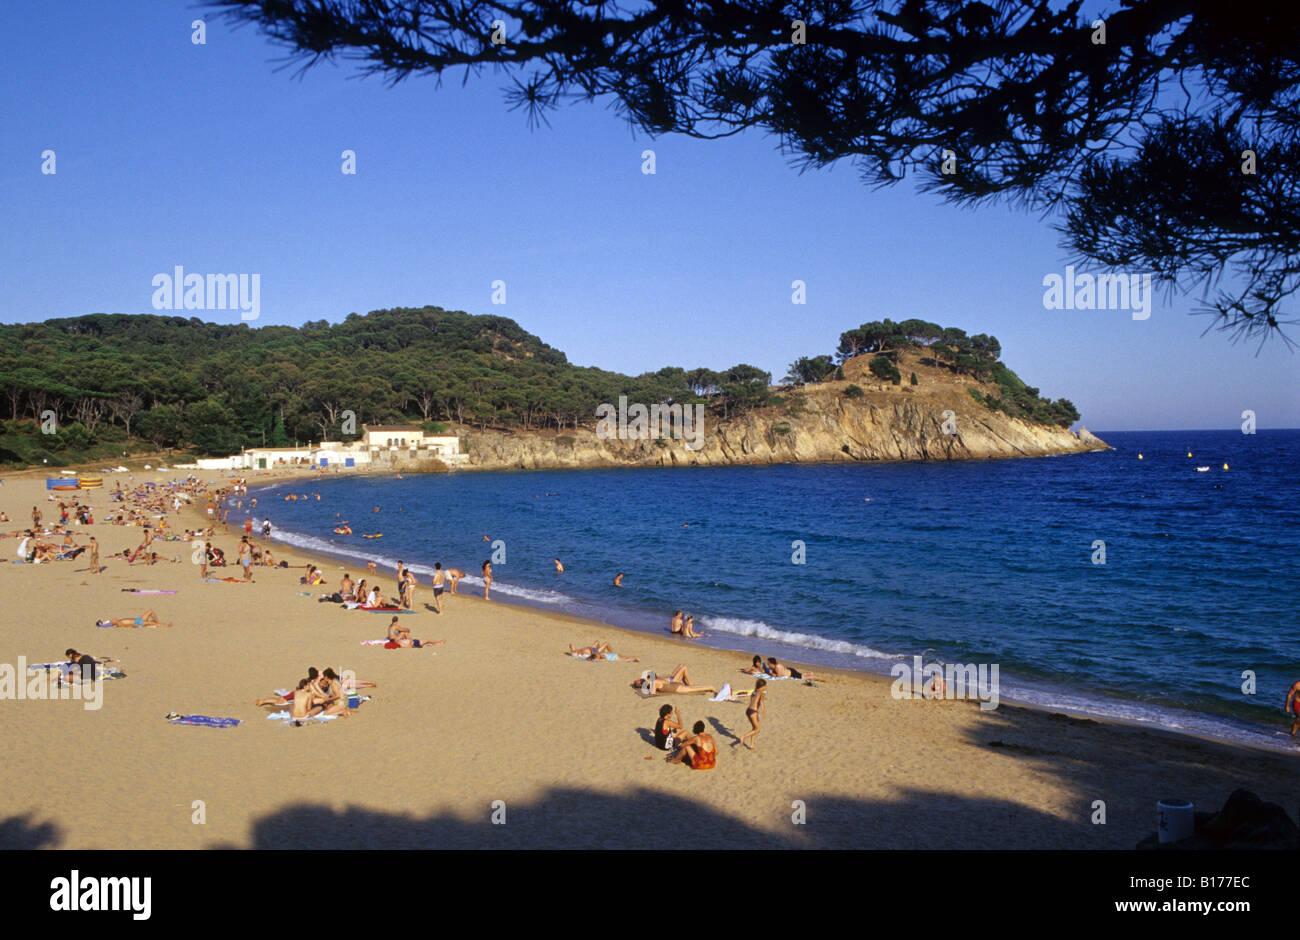 Es Castell beach Palamos Costa Brava Baix Emporda Girona province Catalonia Spain - Stock Image